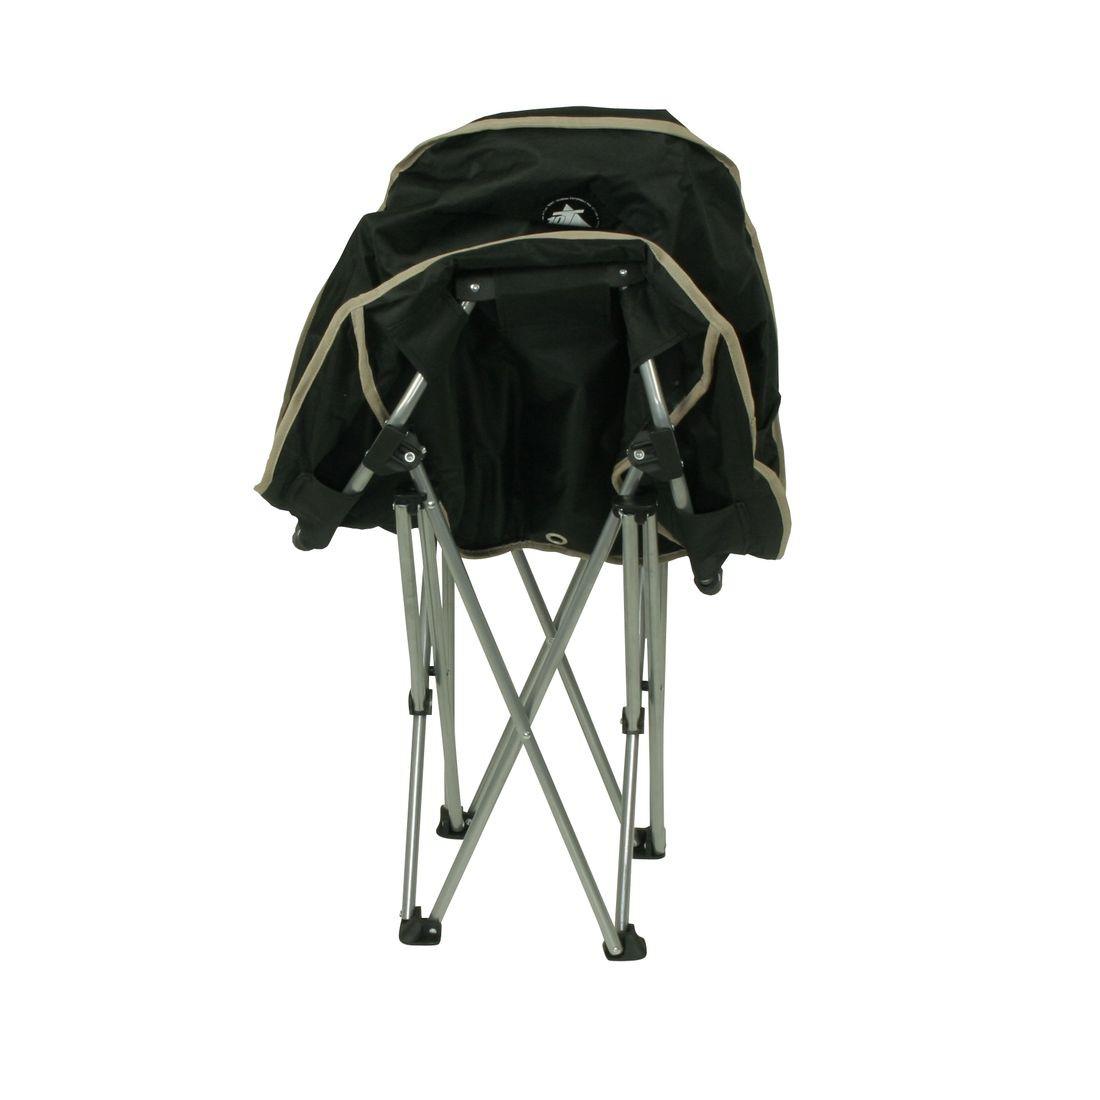 Handy Camping Stools ~ Handy camping stools chaise pliante de transport plage